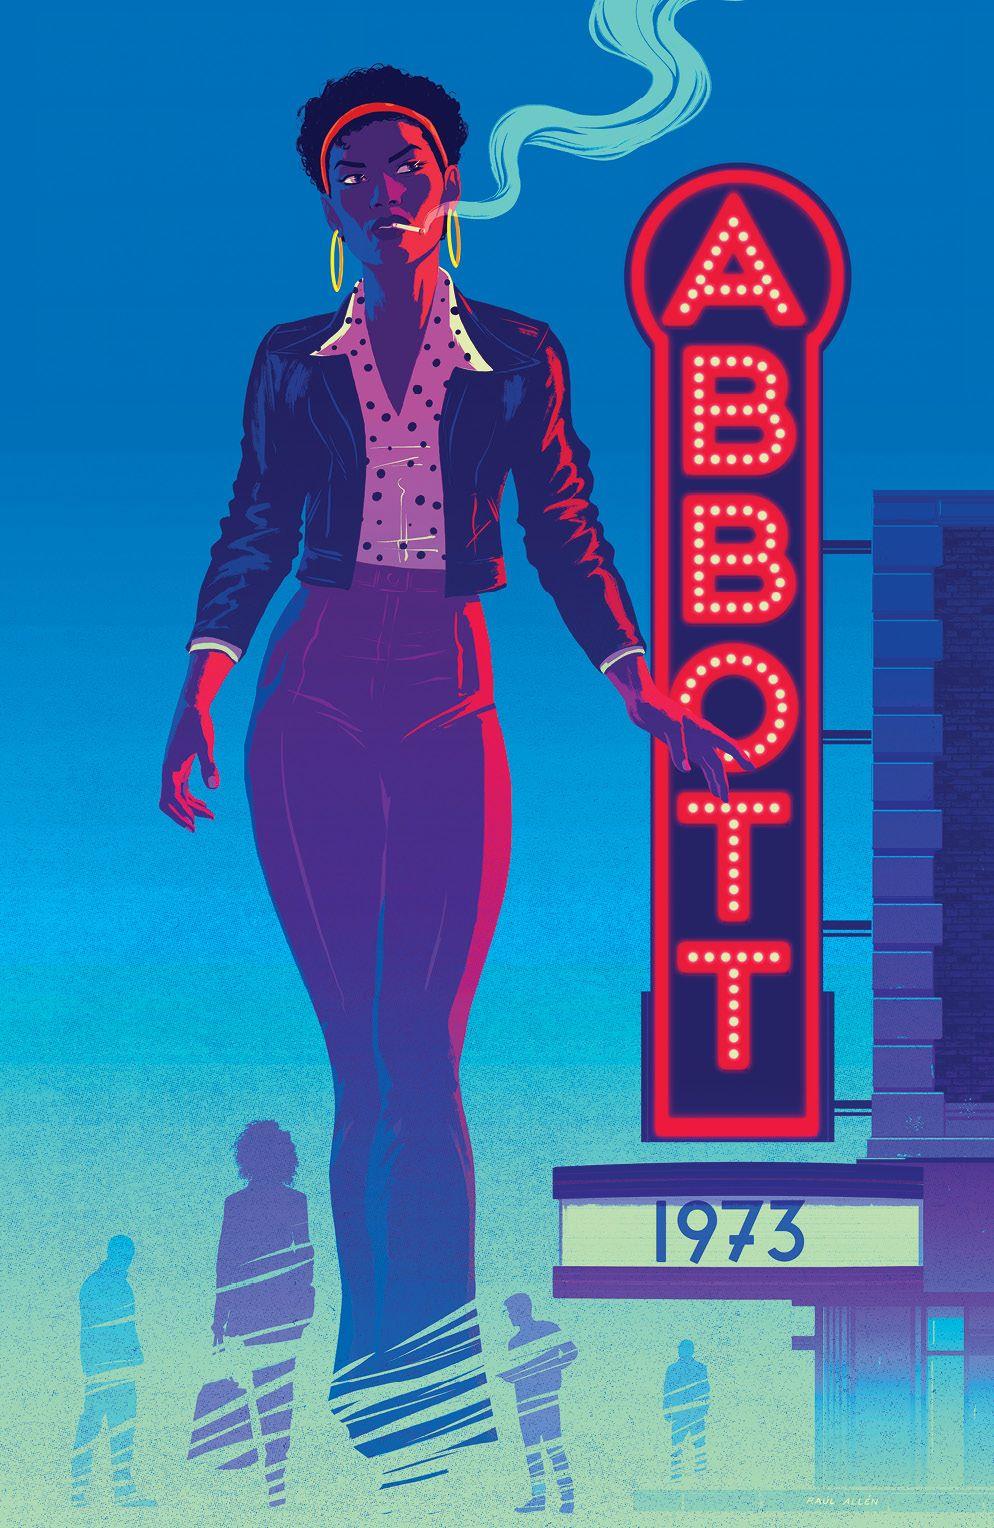 Abbott_1973_002_Cover_B_1970sVariant ComicList: BOOM! Studios New Releases for 02/17/2021